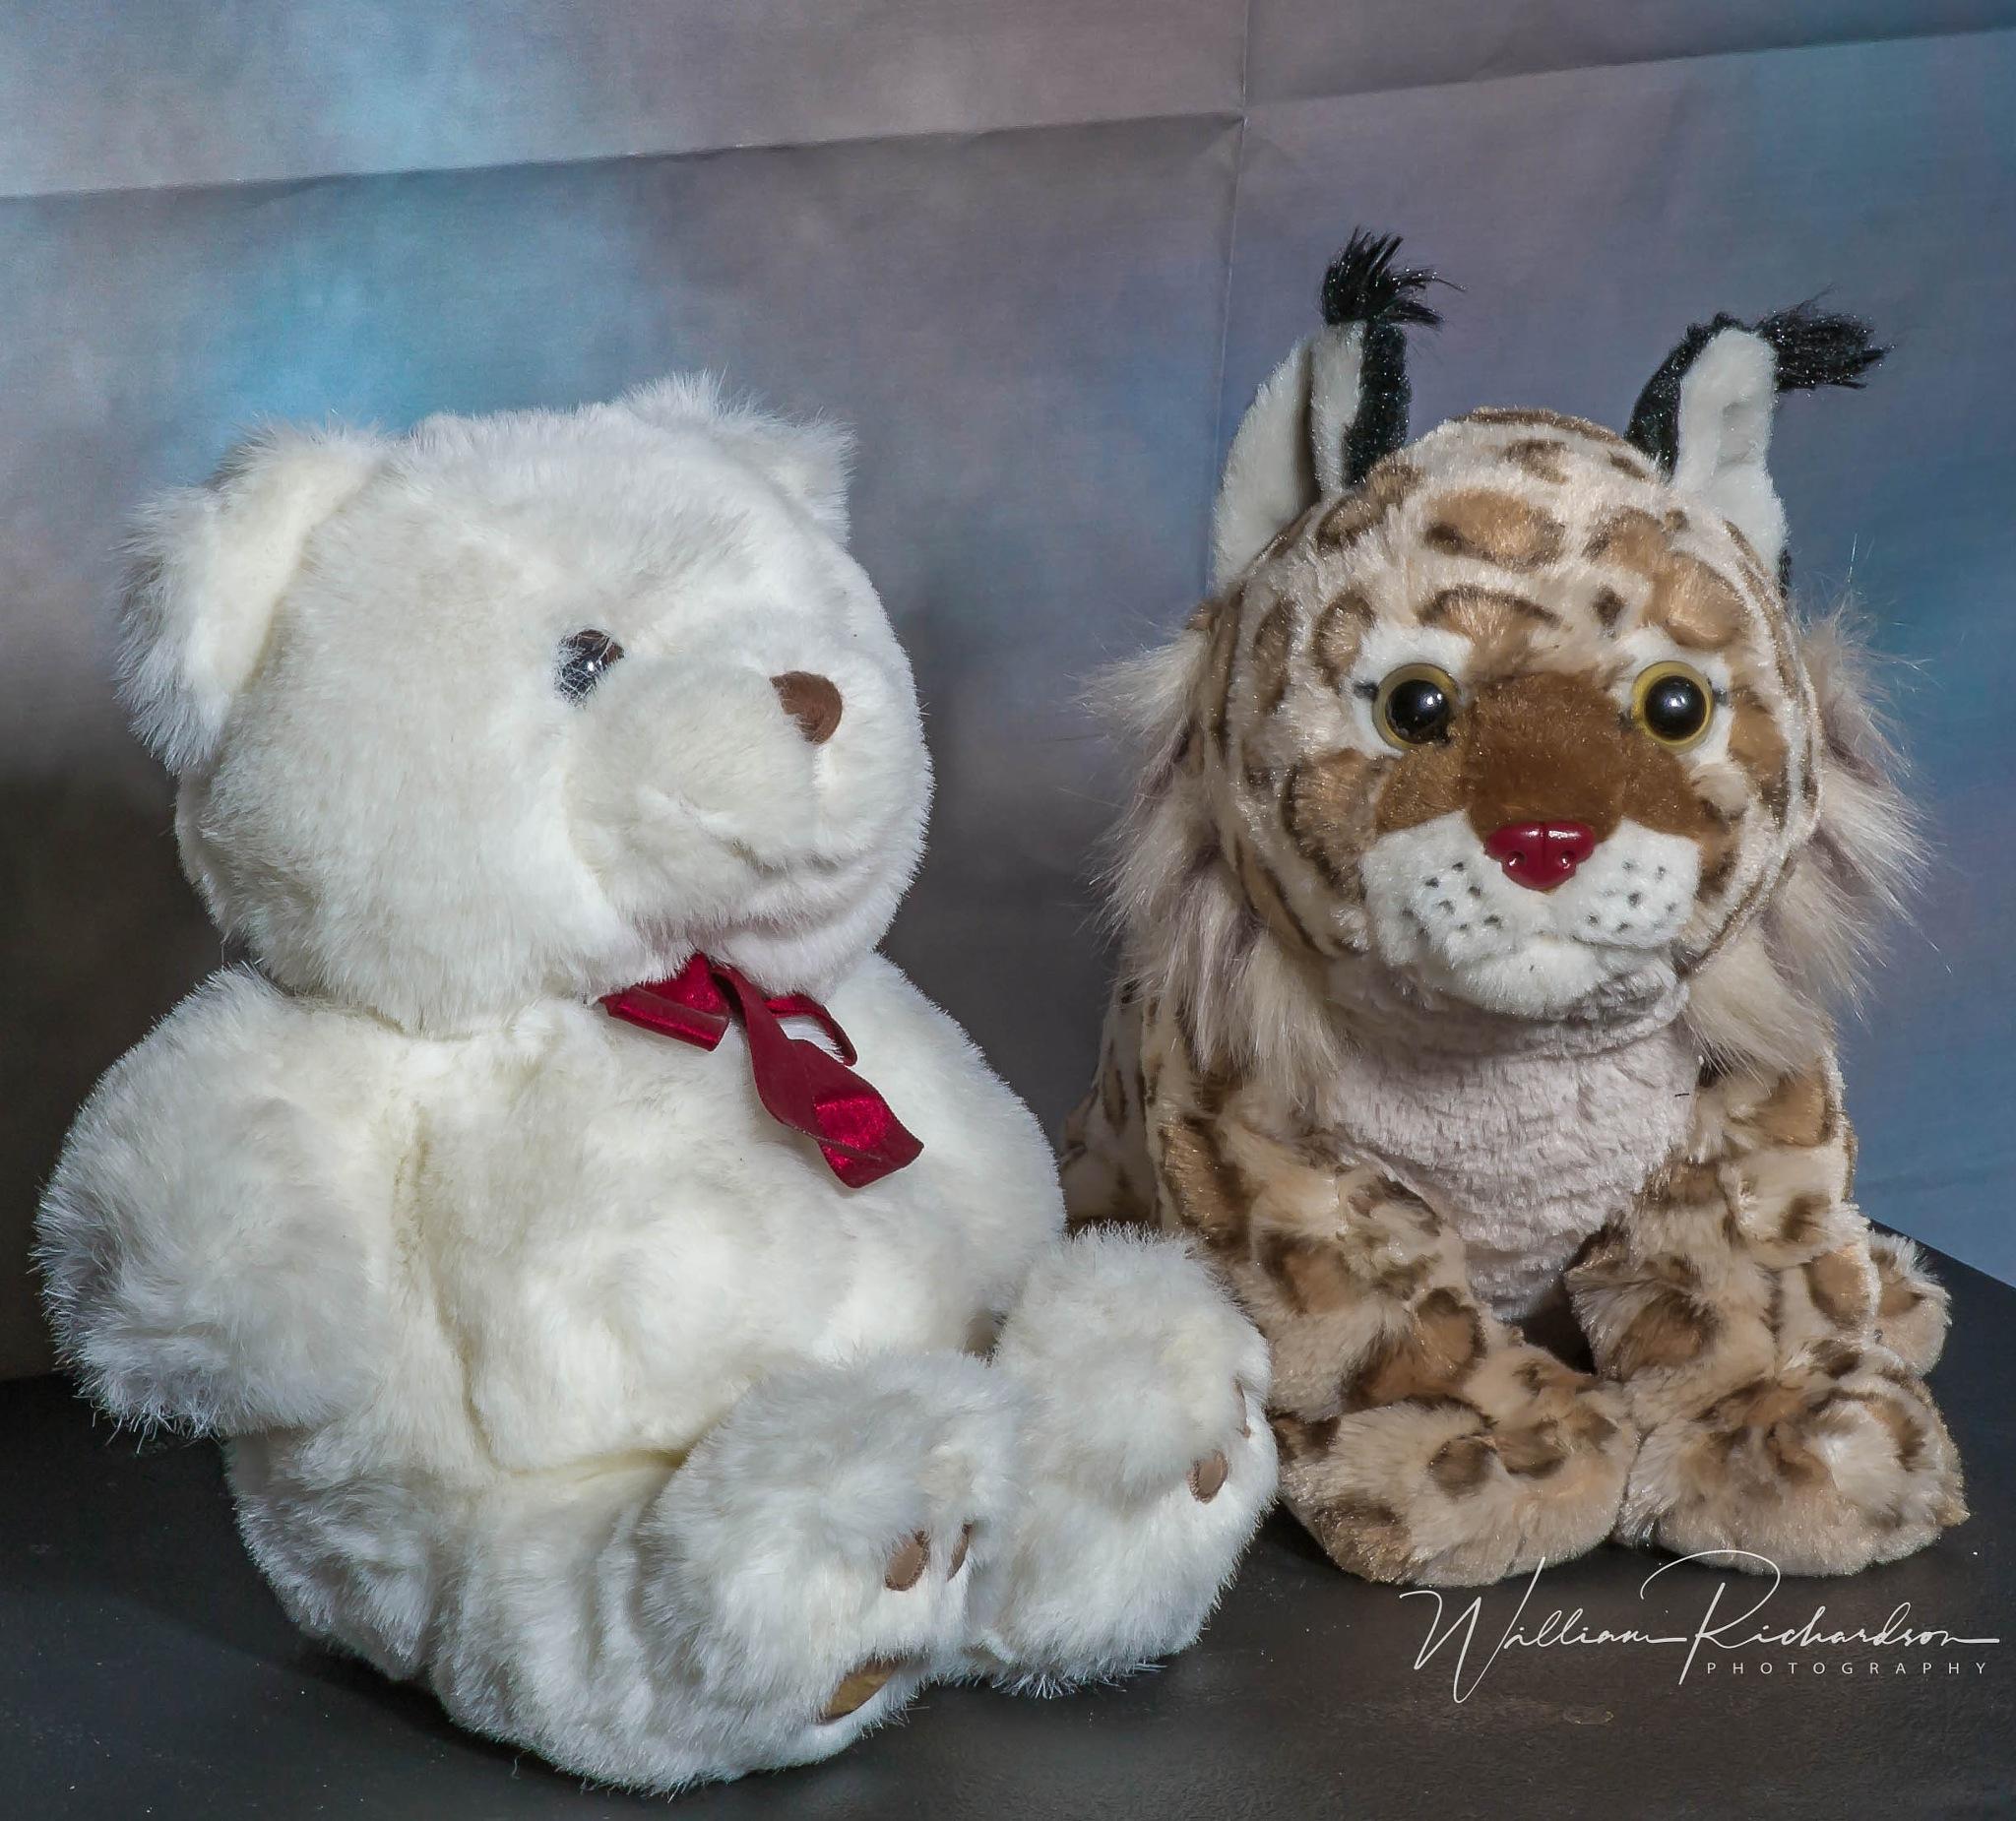 Stuffed Animals by William Richardson